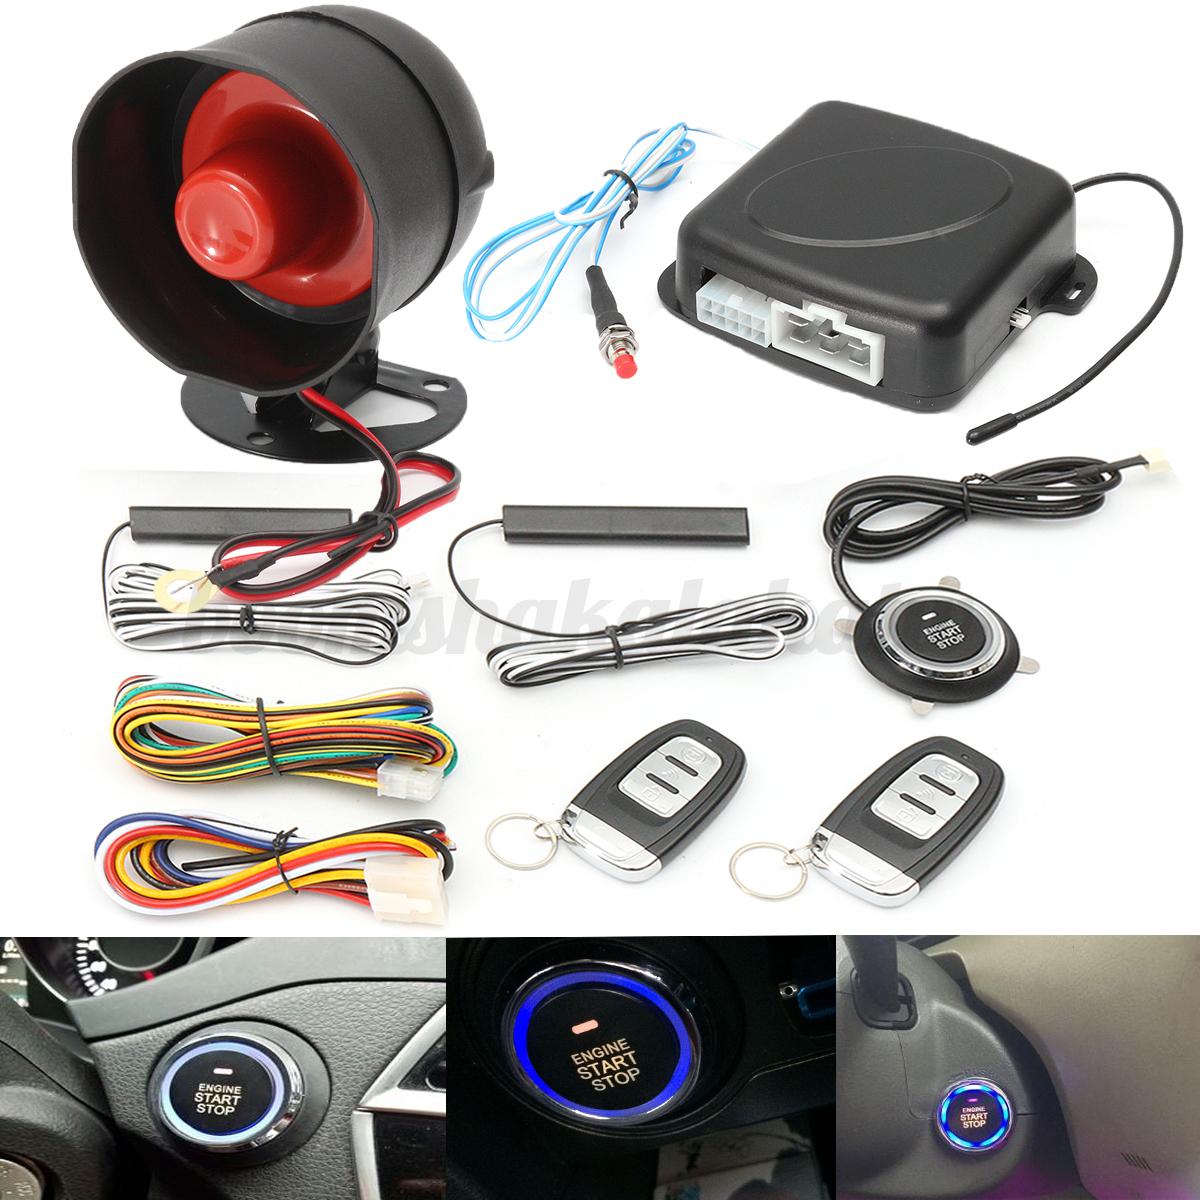 Keyless Entry Car Push Start Button Rfid Lock Engine: Keyless Entry Car Push Start Button RFID Lock Engine